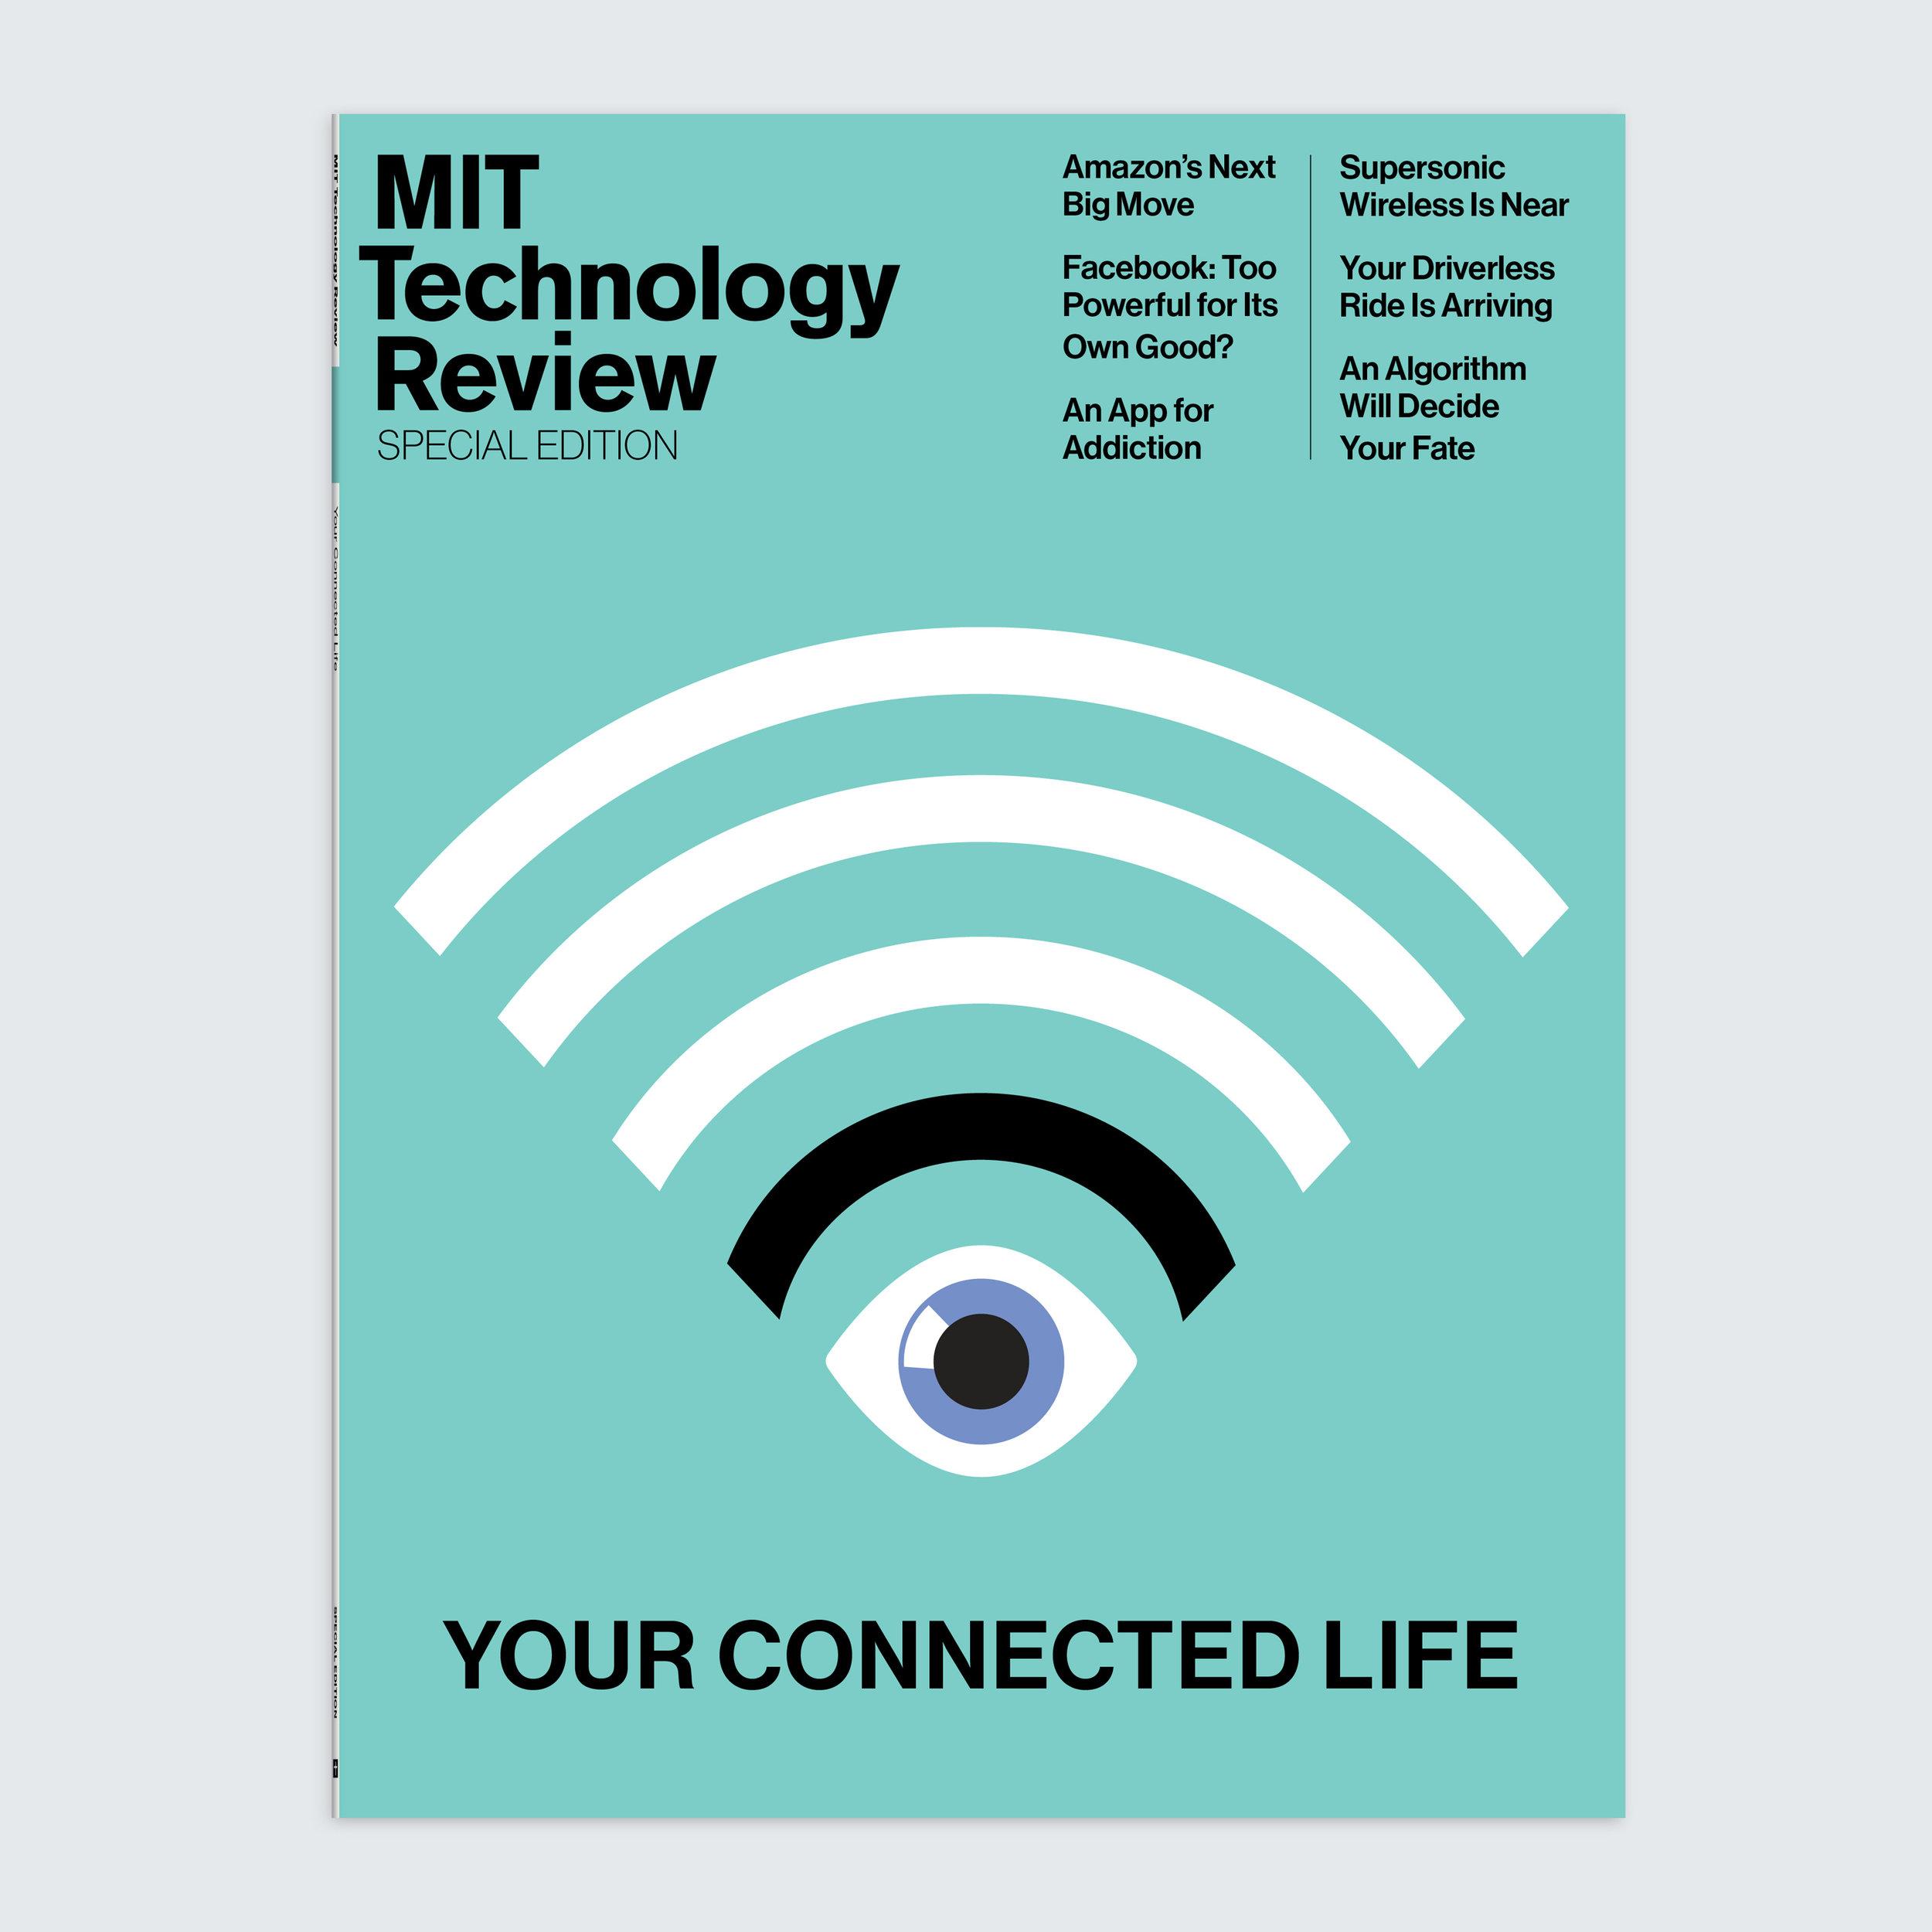 MIT_TECH_delcancompany.jpg